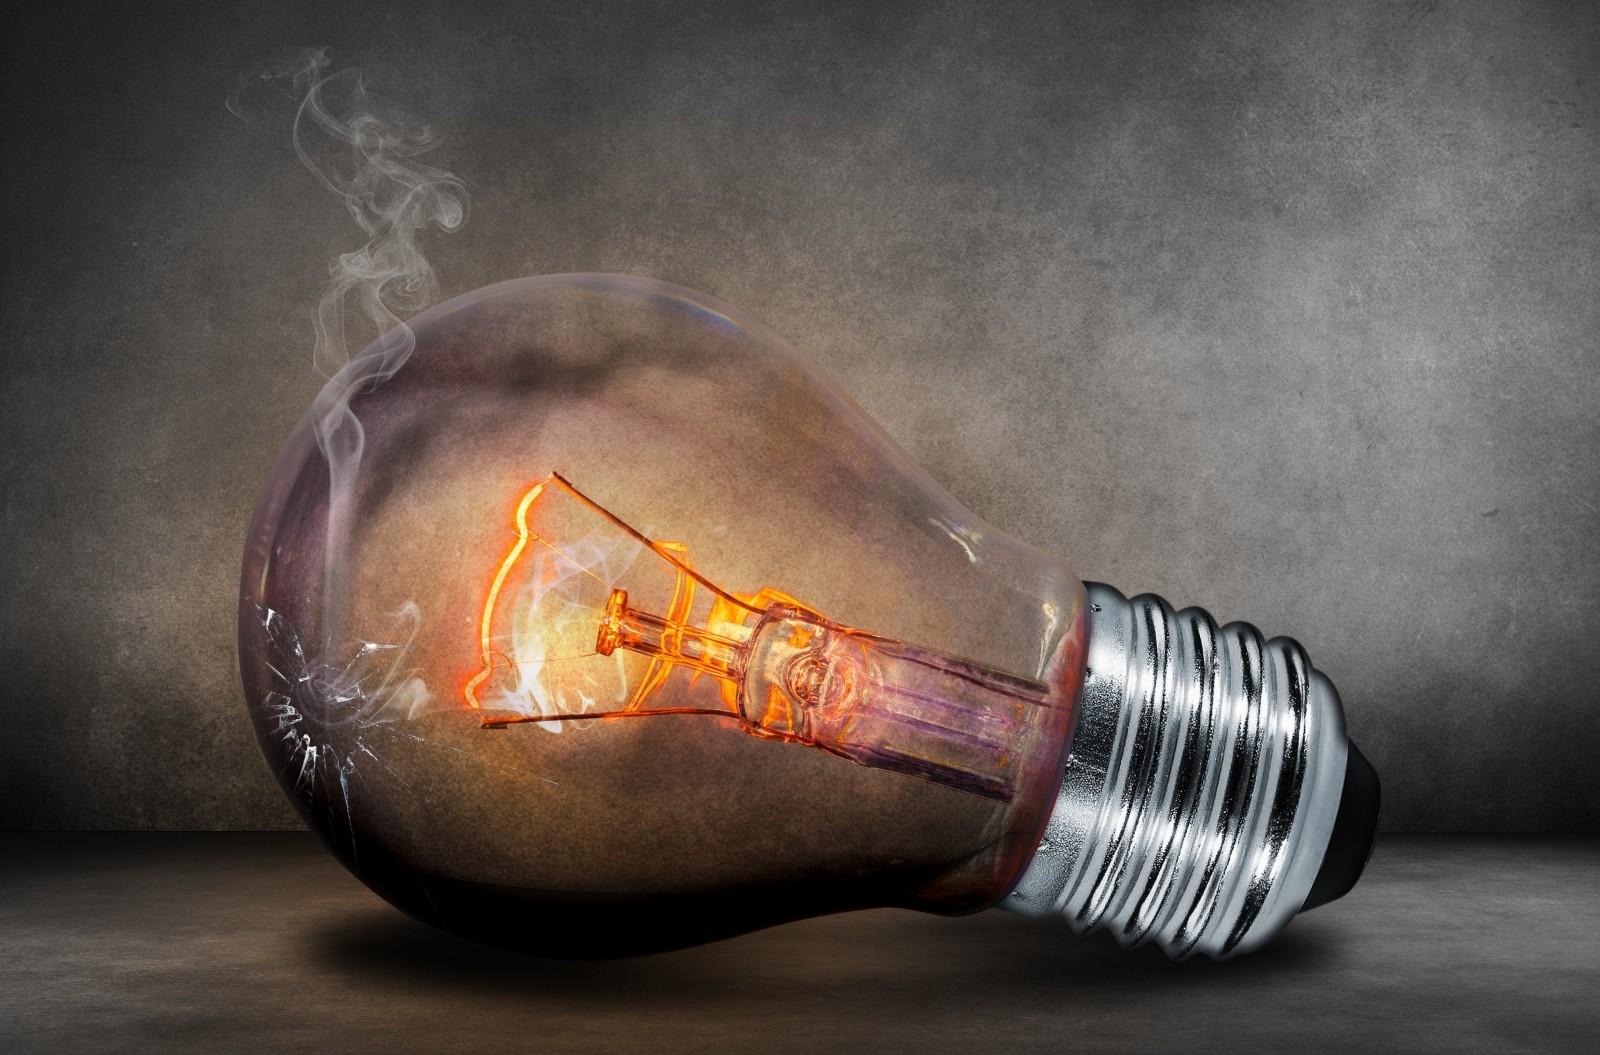 light-bulb-current-light-glow-glow-lamp-filament